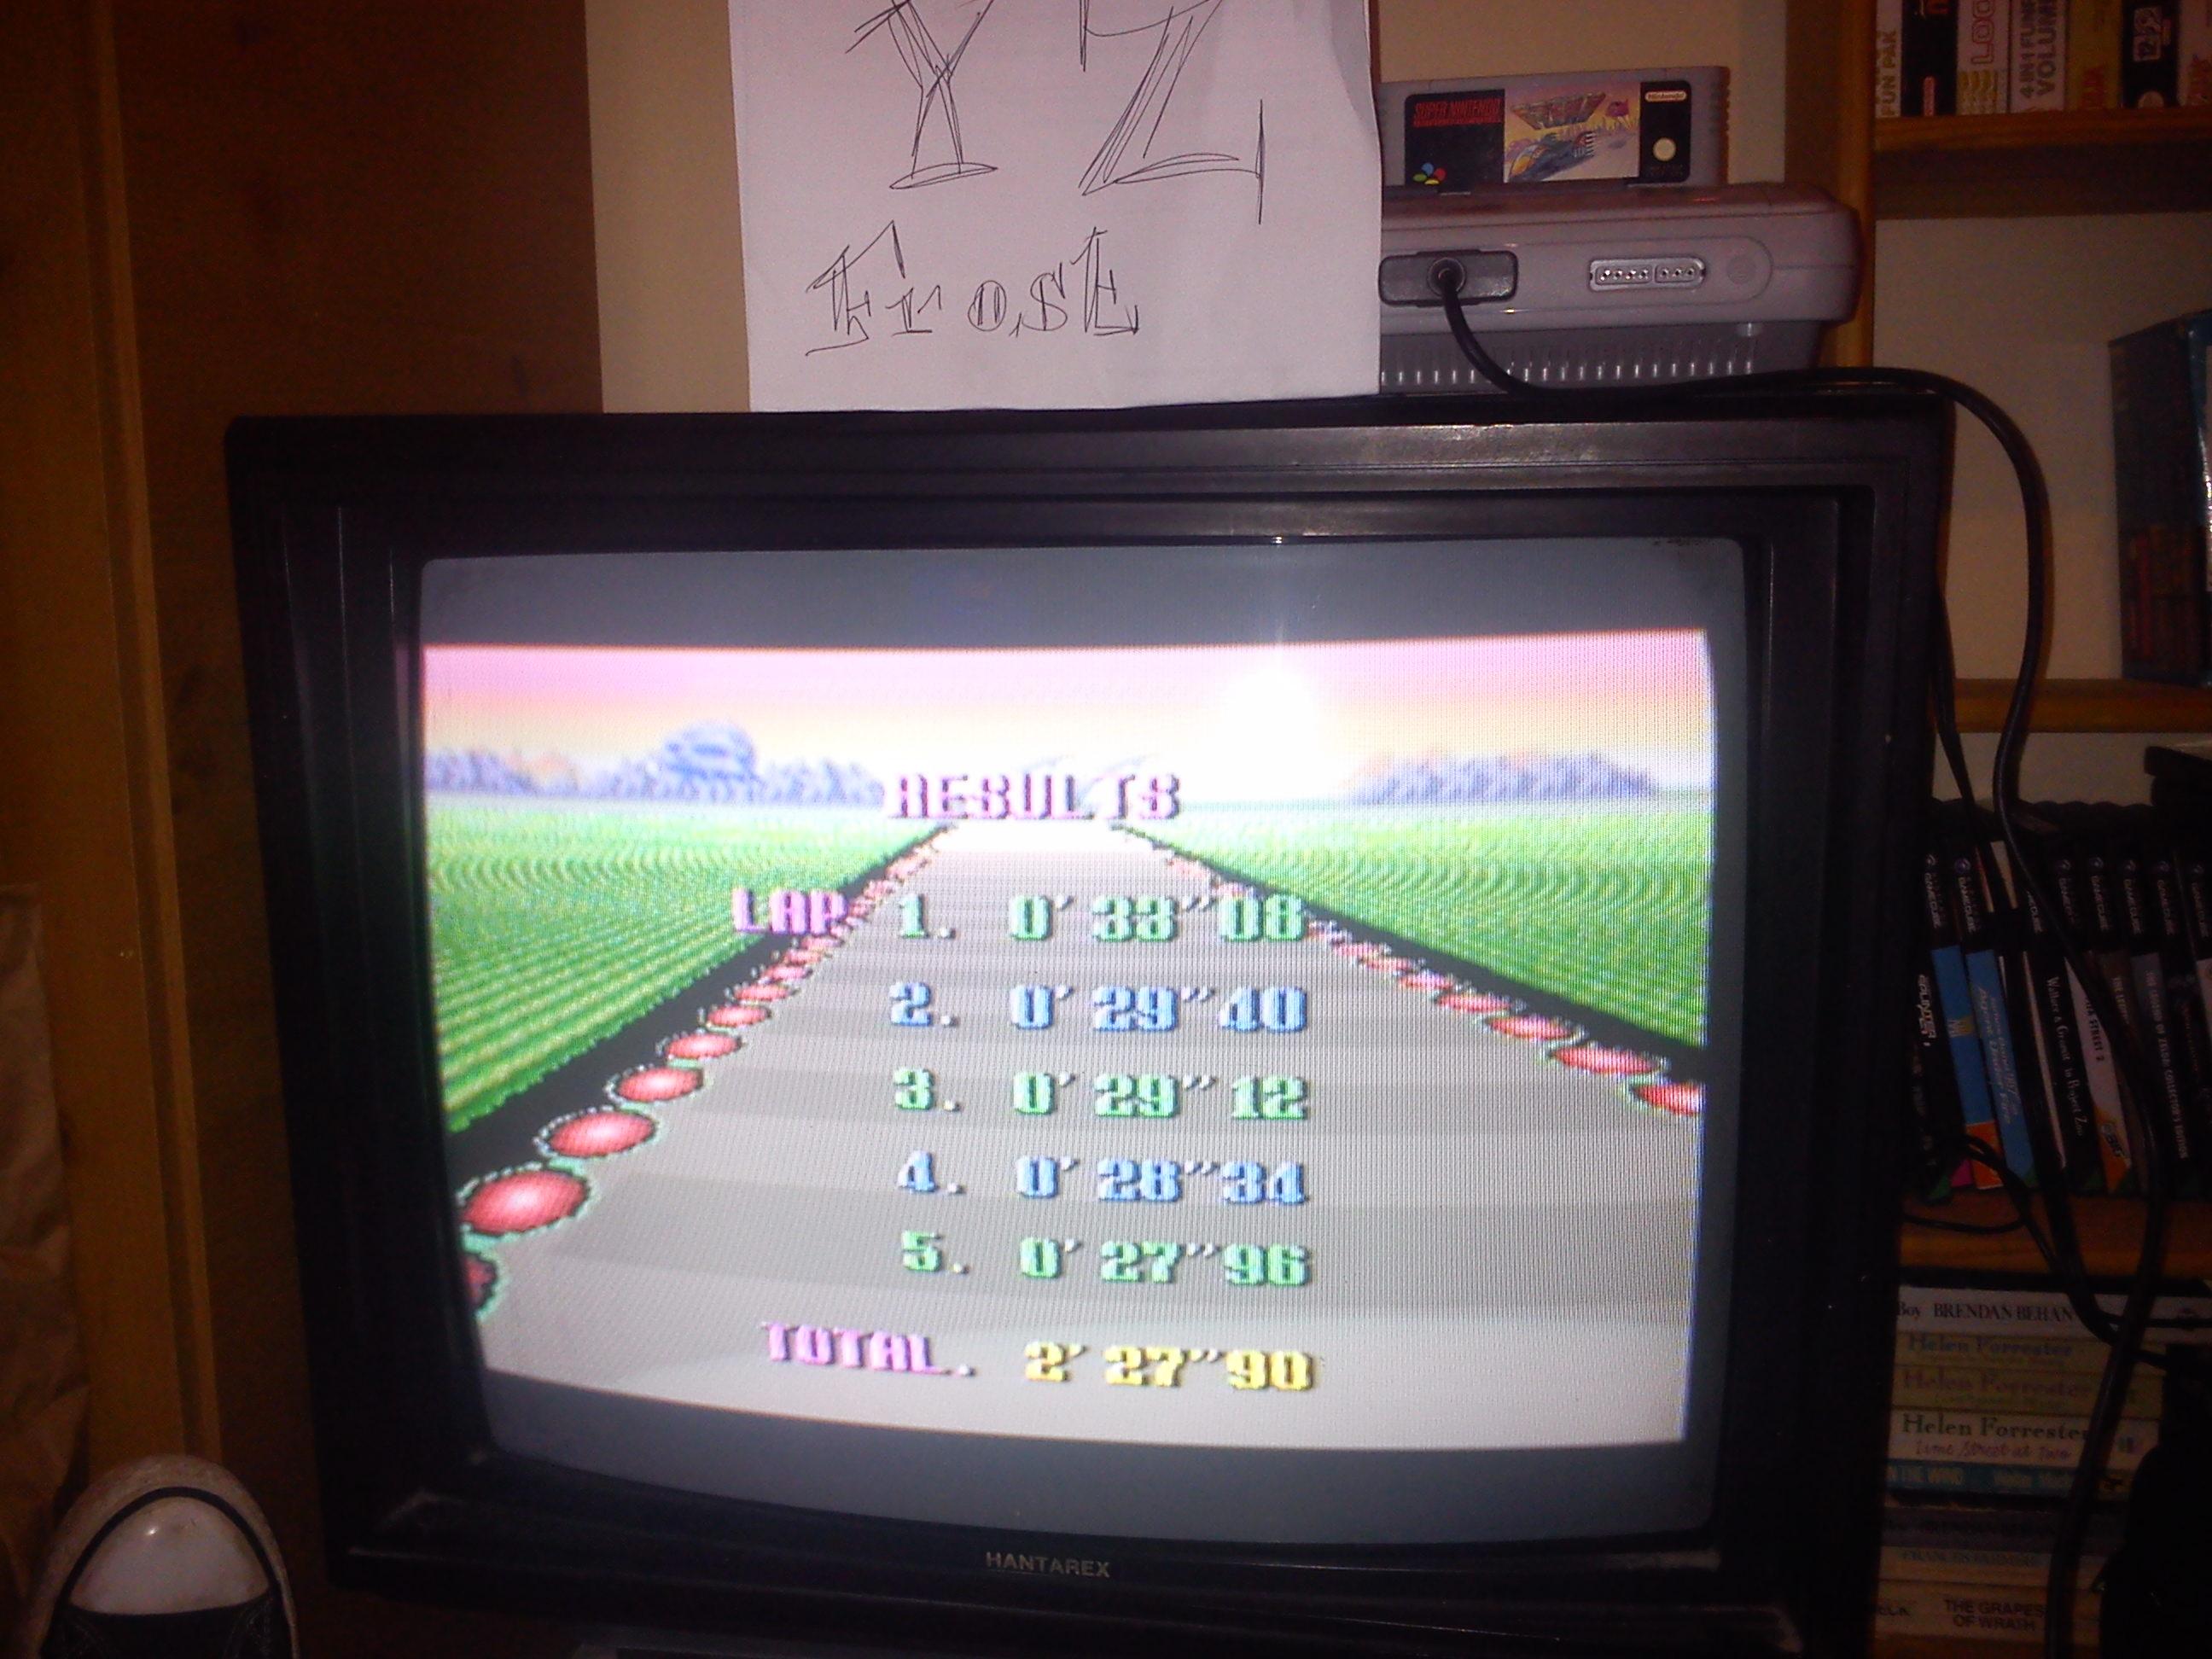 Fr0st: F-Zero: Death Wind I [Beginner] (SNES/Super Famicom) 0:02:27.9 points on 2014-11-03 17:24:36